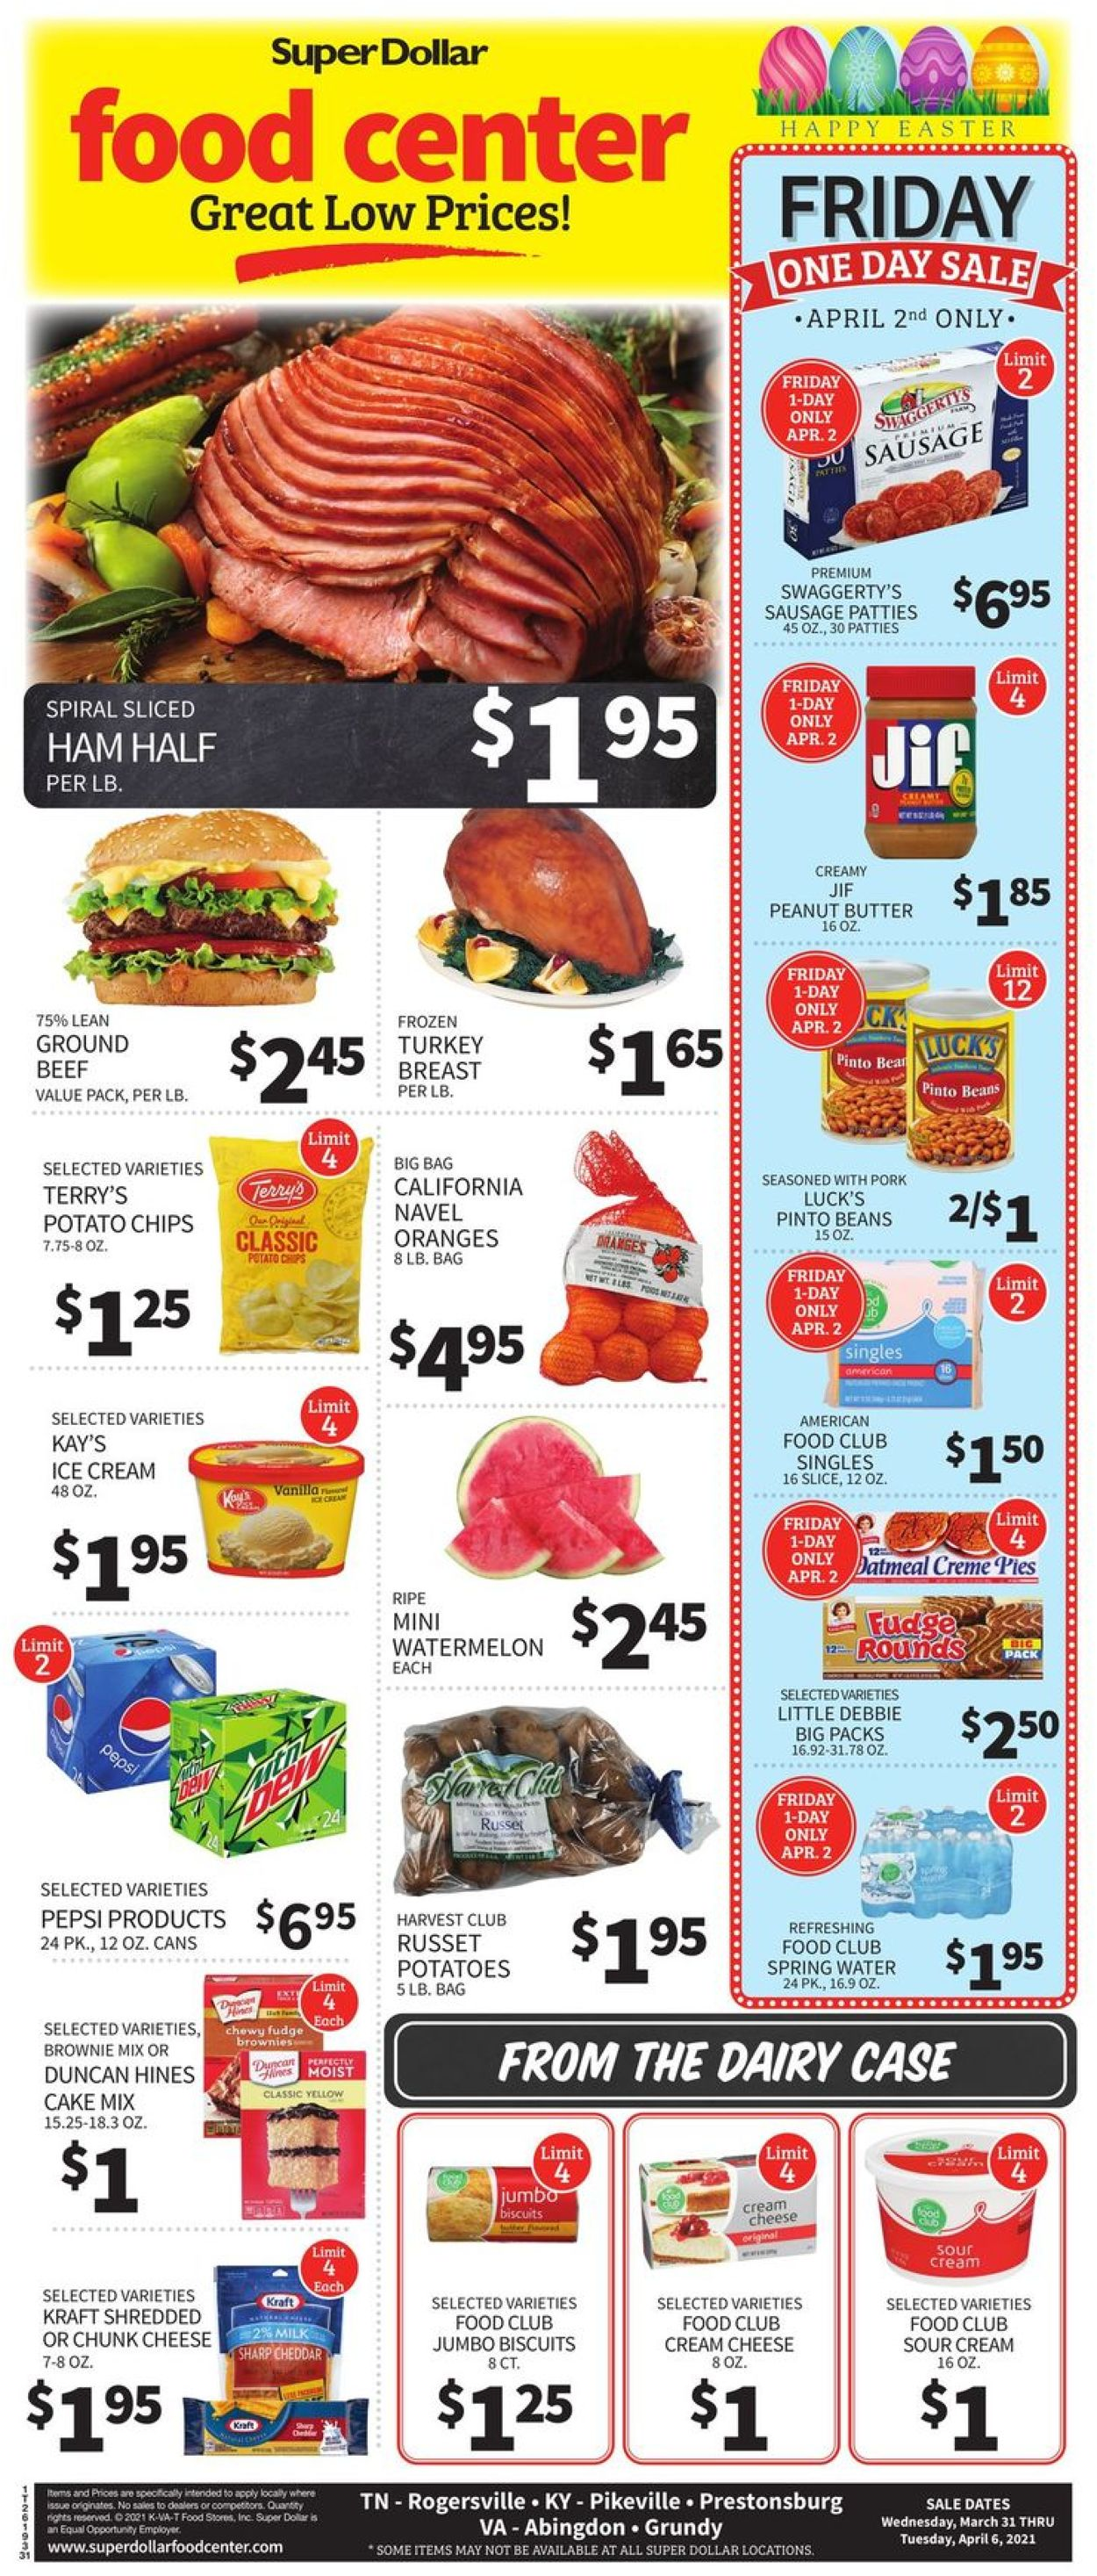 Super Dollar Food Center Easter 2021 ad Weekly Ad Circular - valid 03/31-04/06/2021